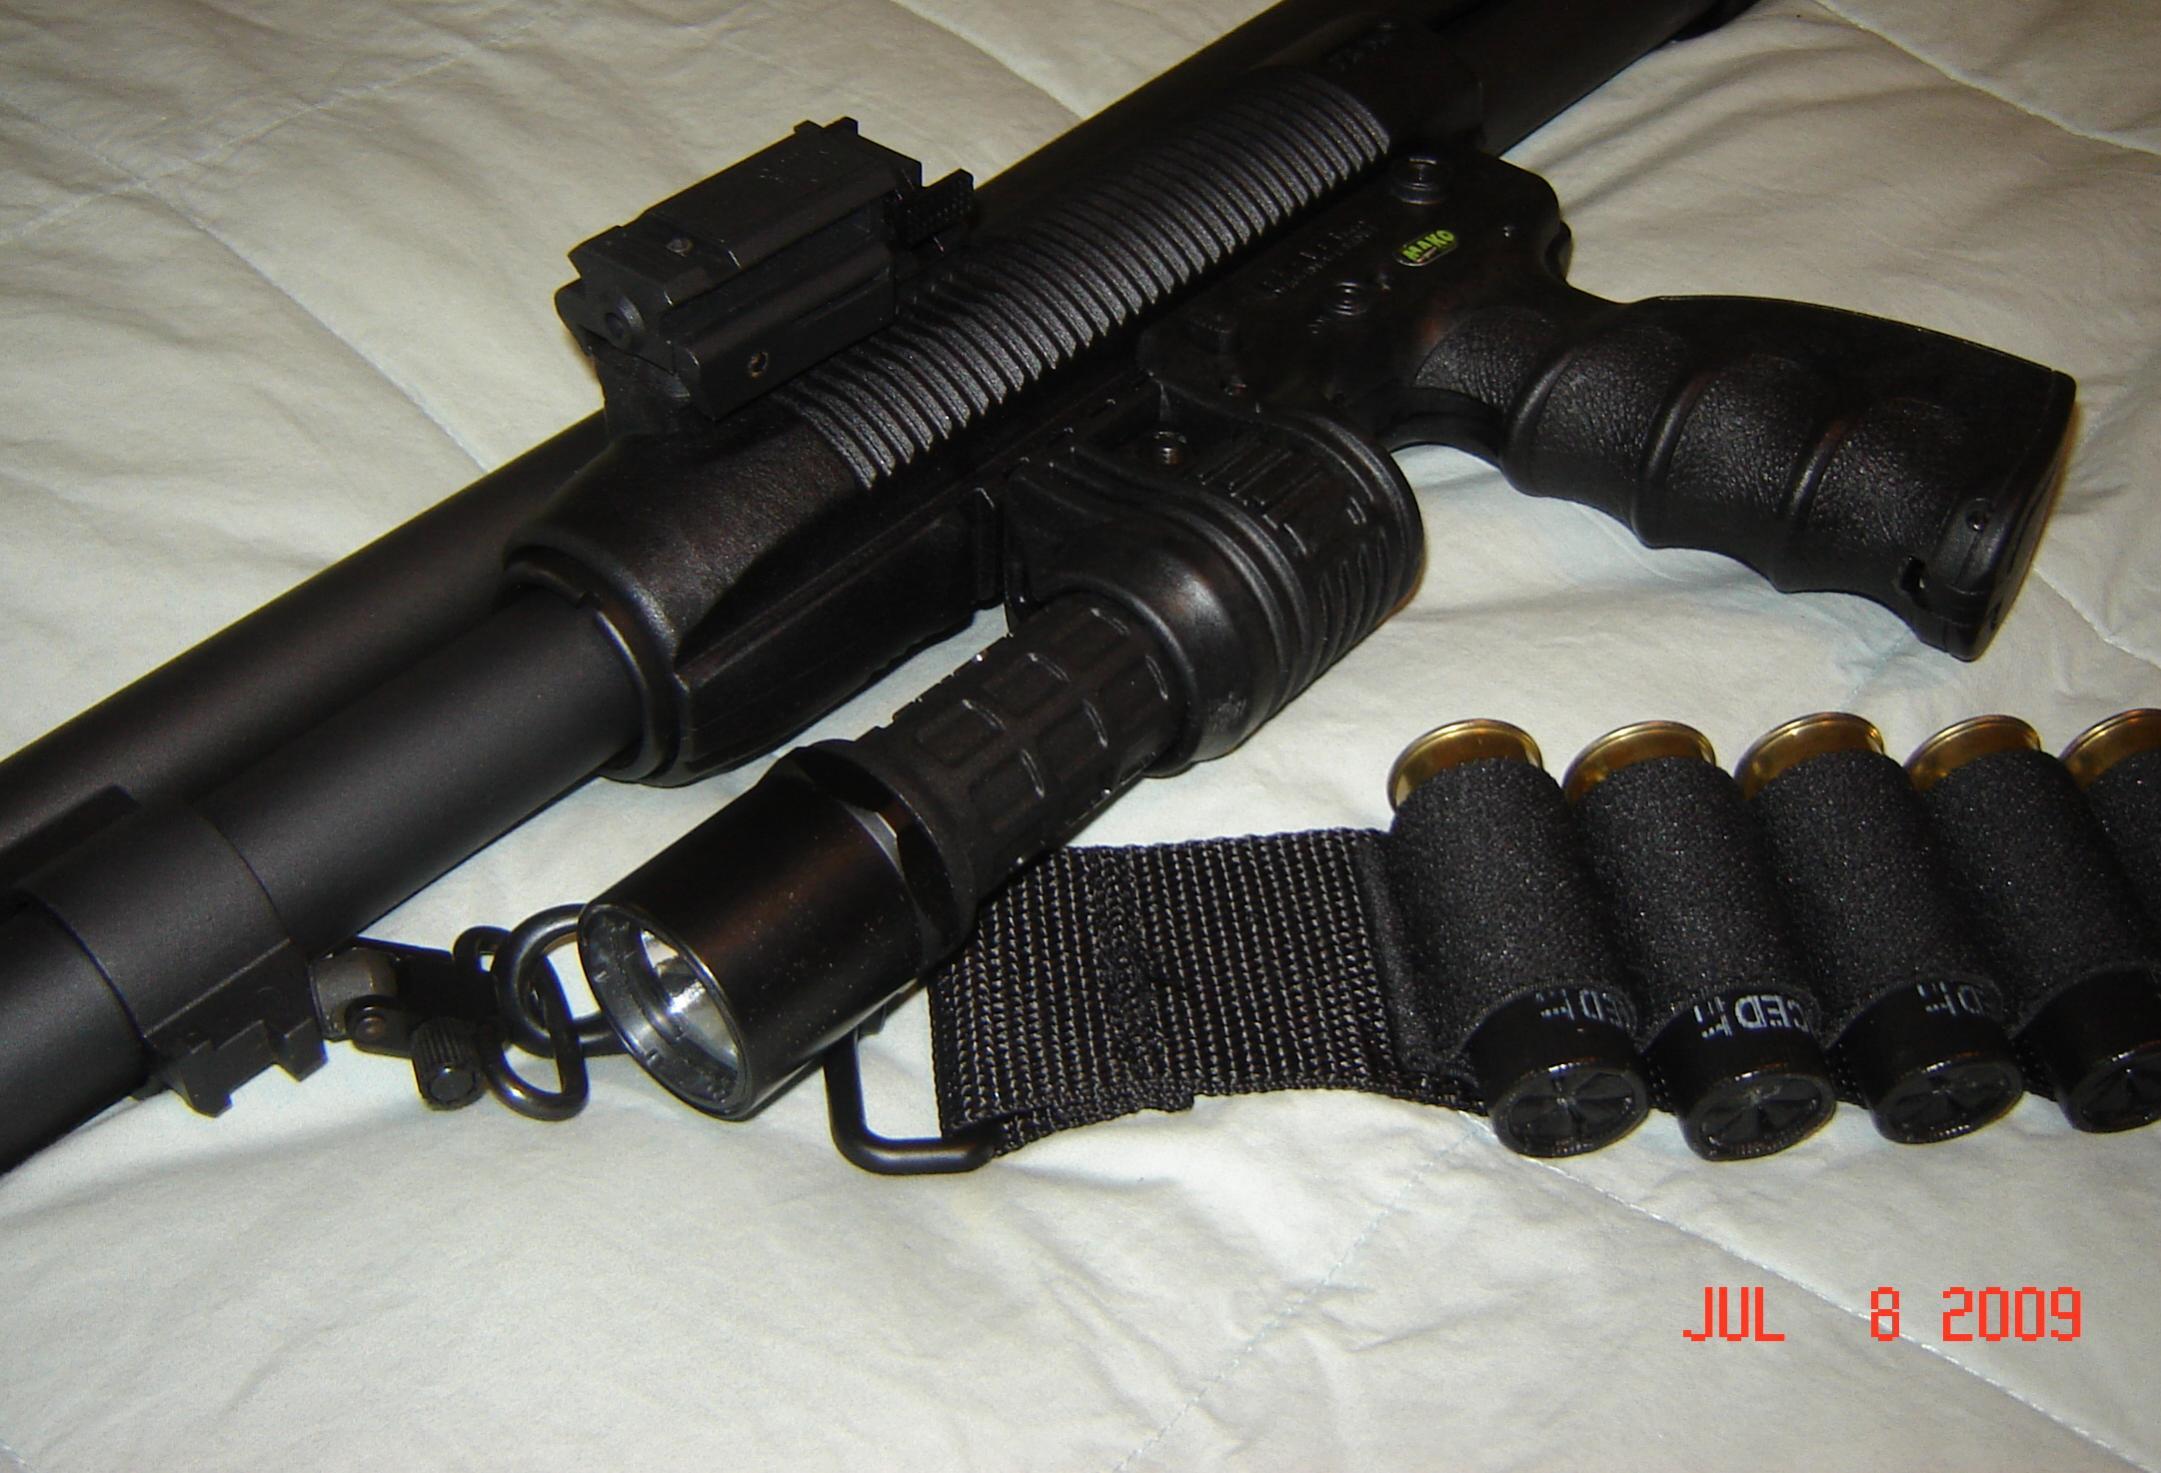 Recommendations for BRIGHT light for Mossberg 500-pistol-grip-pump-002.jpg